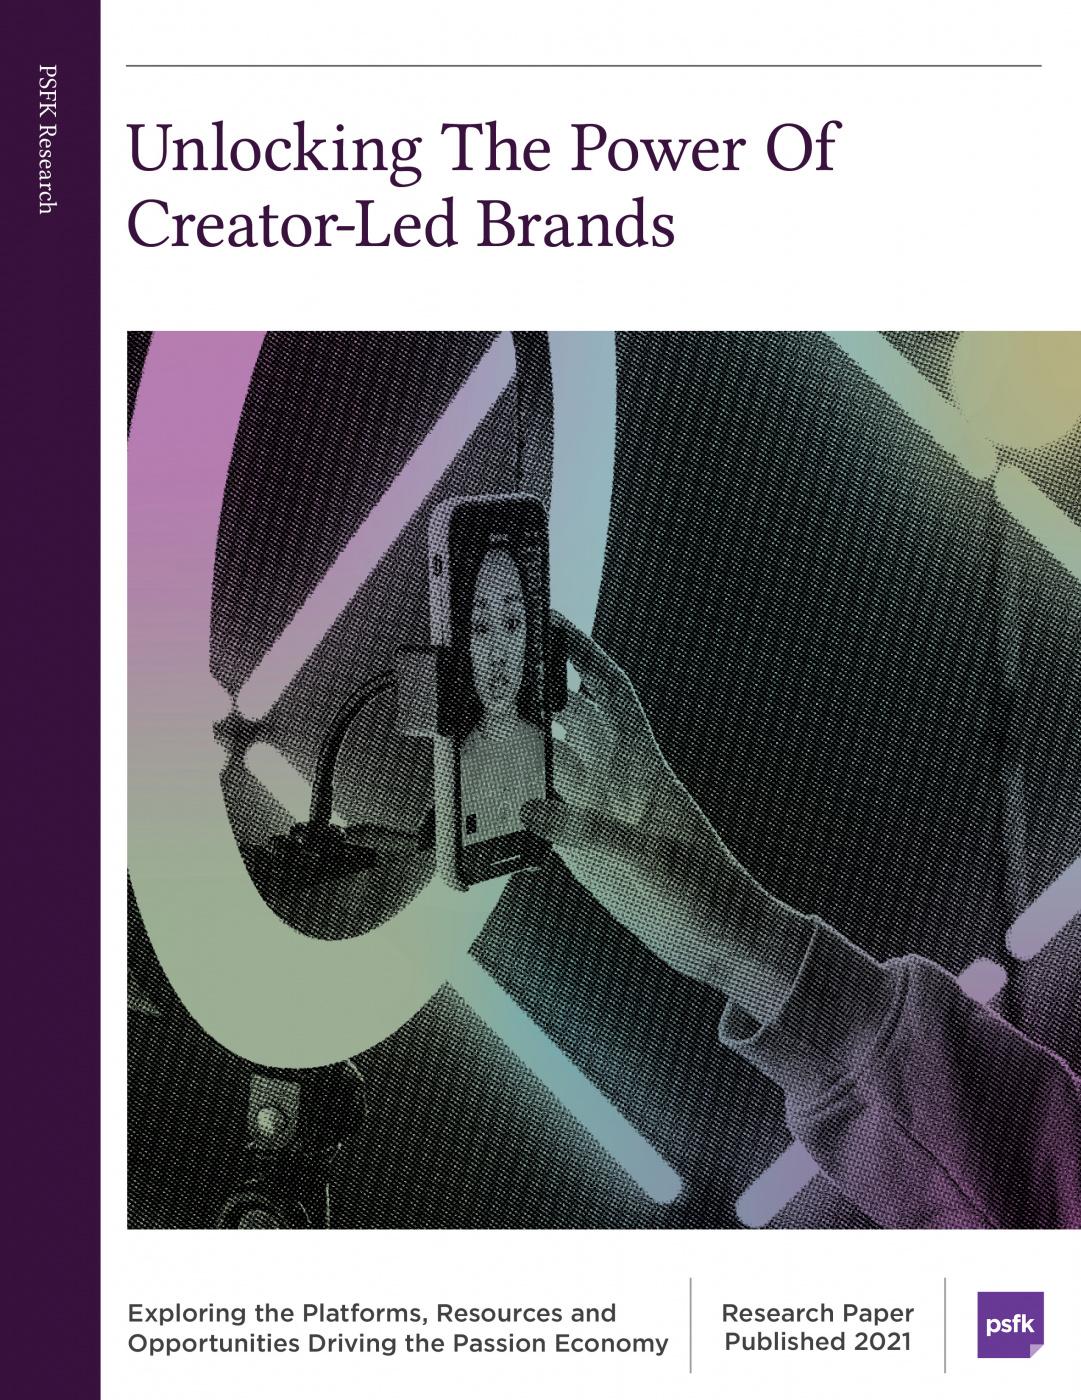 Unlocking the Power of Creator Led Brands